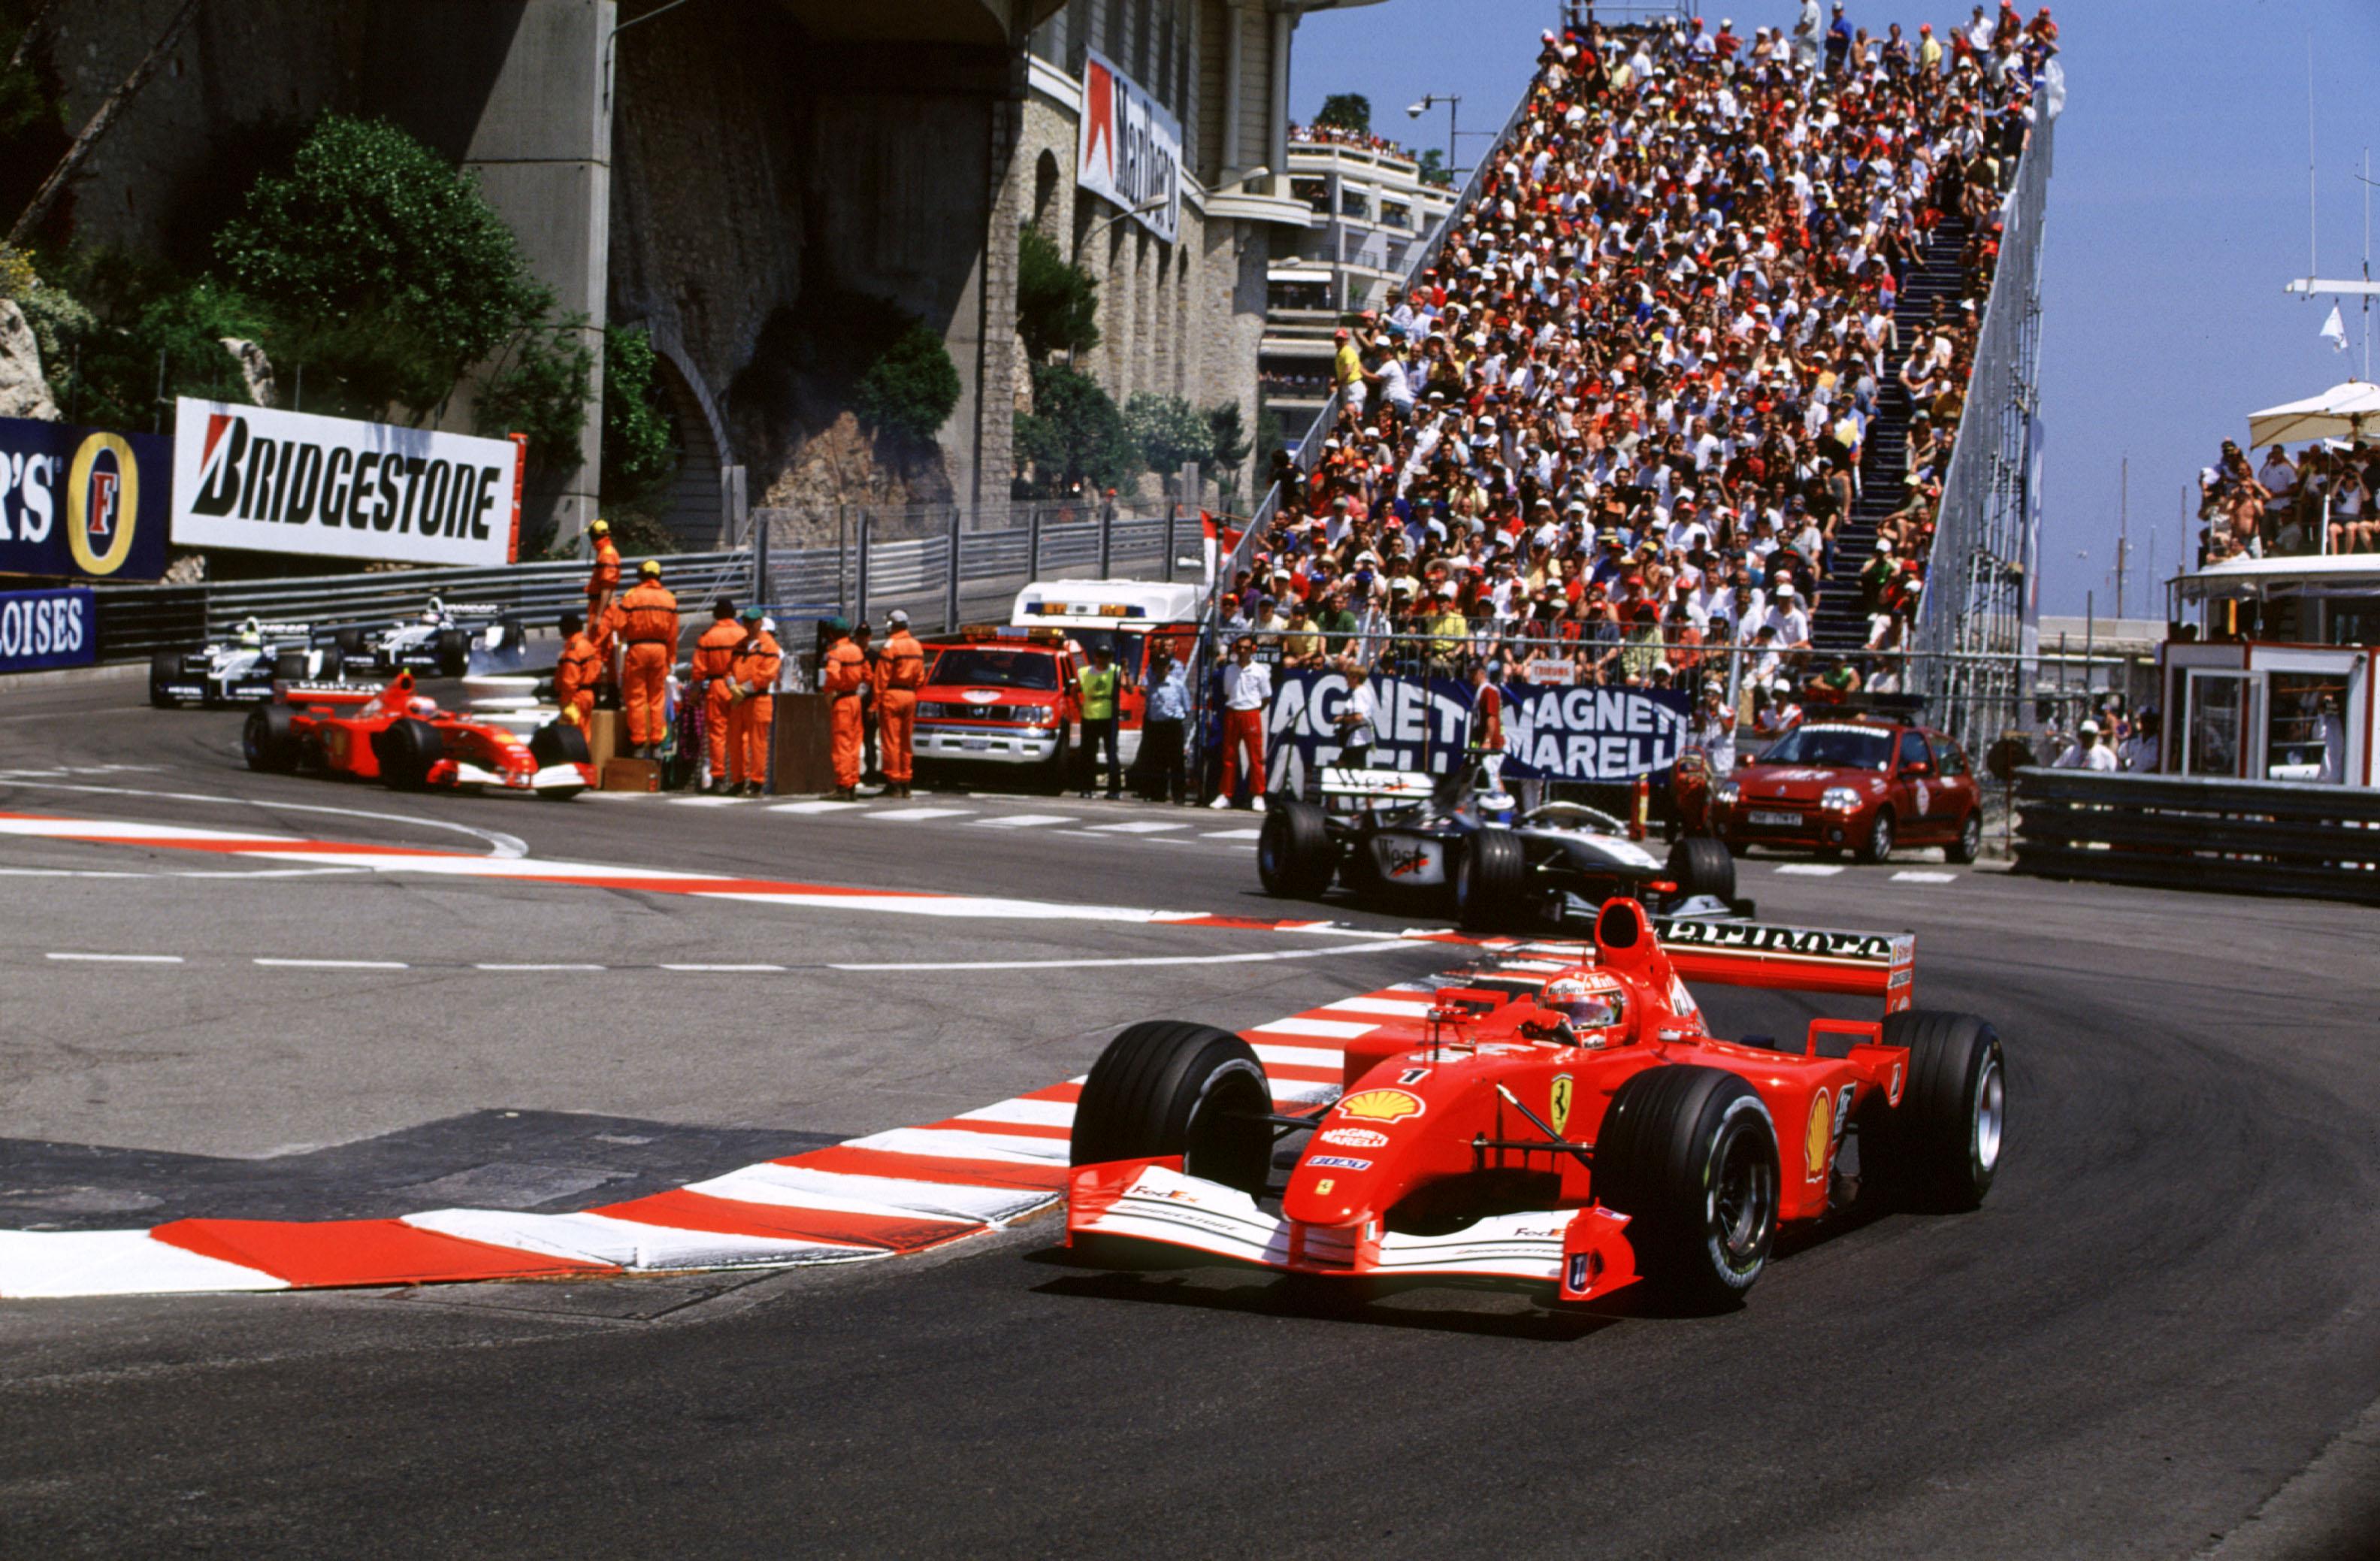 Michael Schumacher and his Ferrari on the way to victory at the 2001 Grand Prix de Monaco.